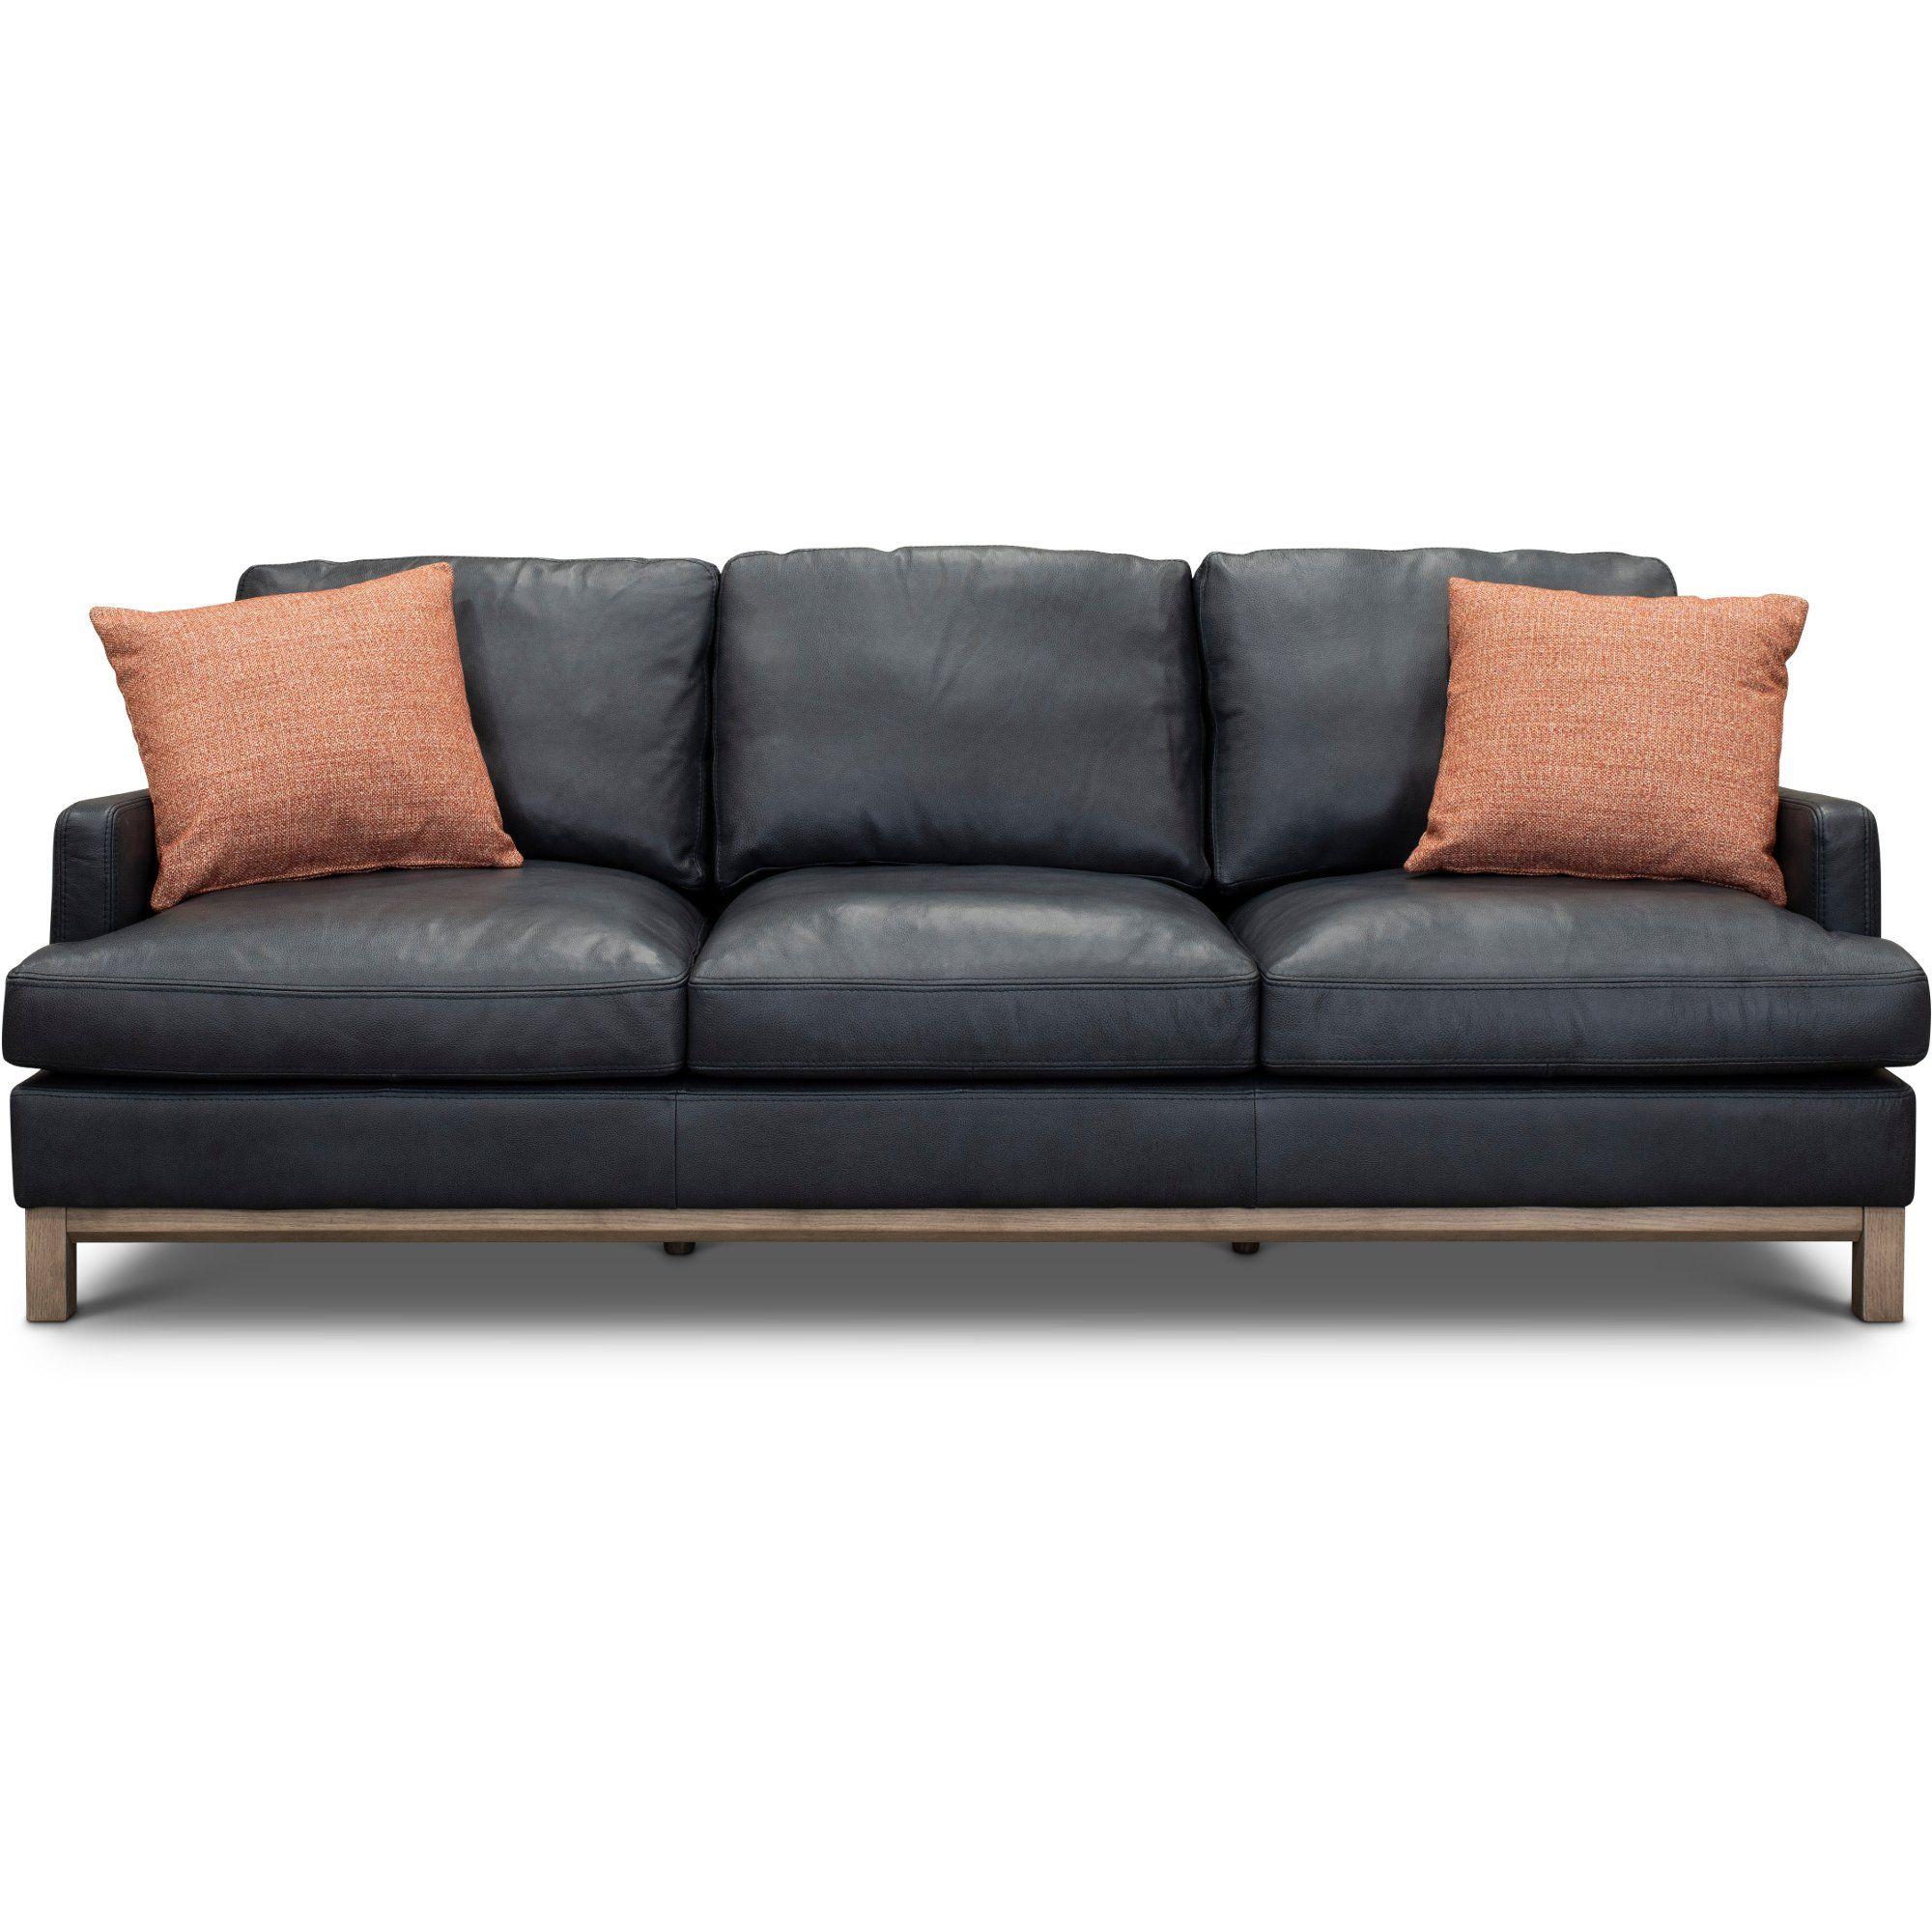 Mid Century Modern Dark Blue Leather Sofa Westport Rc Willey Furniture Store Blue Leather Sofa Mid Century Leather Sofa Modern Leather Sofa